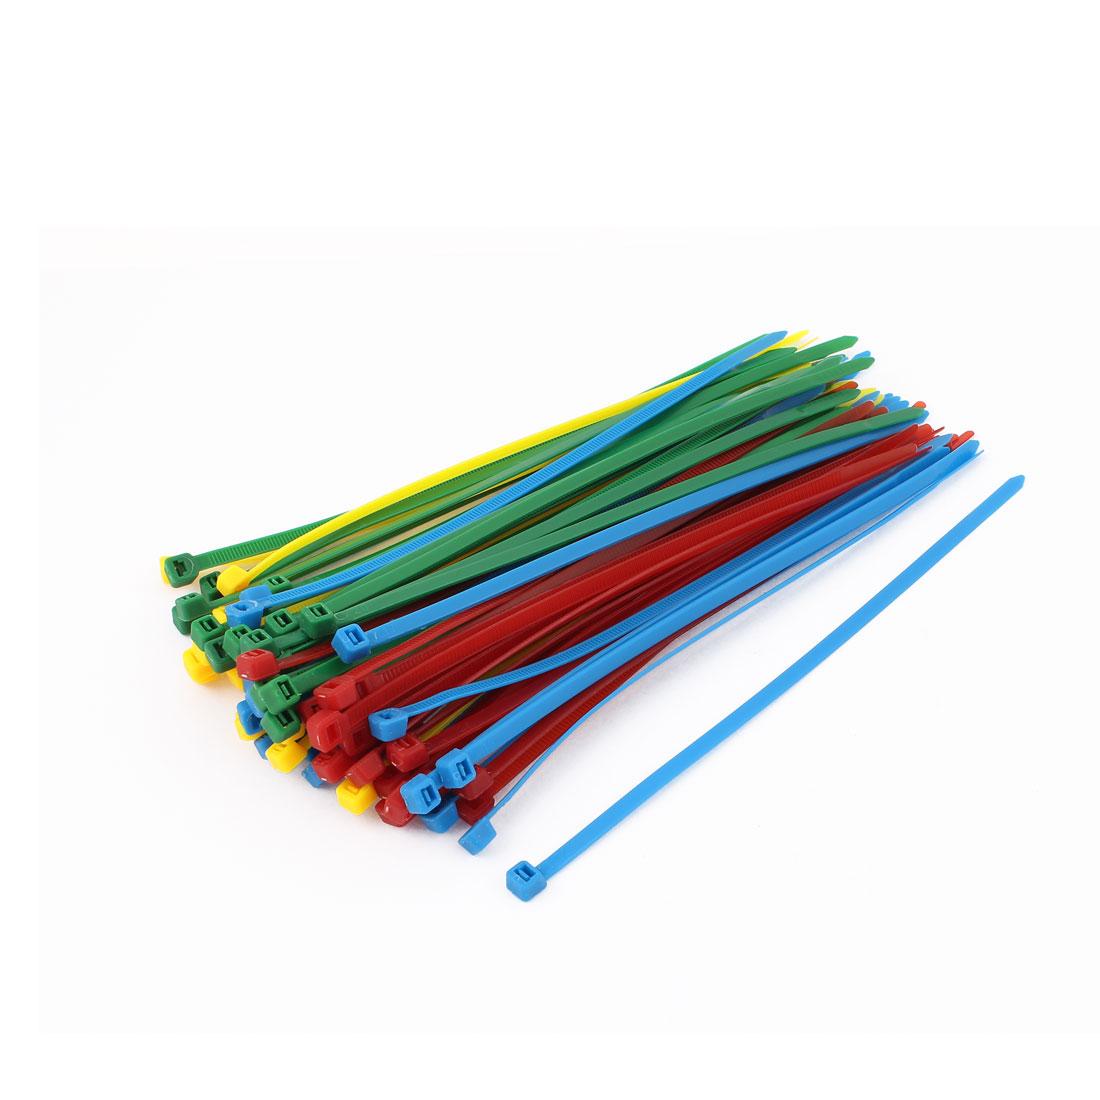 80Pcs Plastic Self-Locking Packaging Cable Ties Fastener